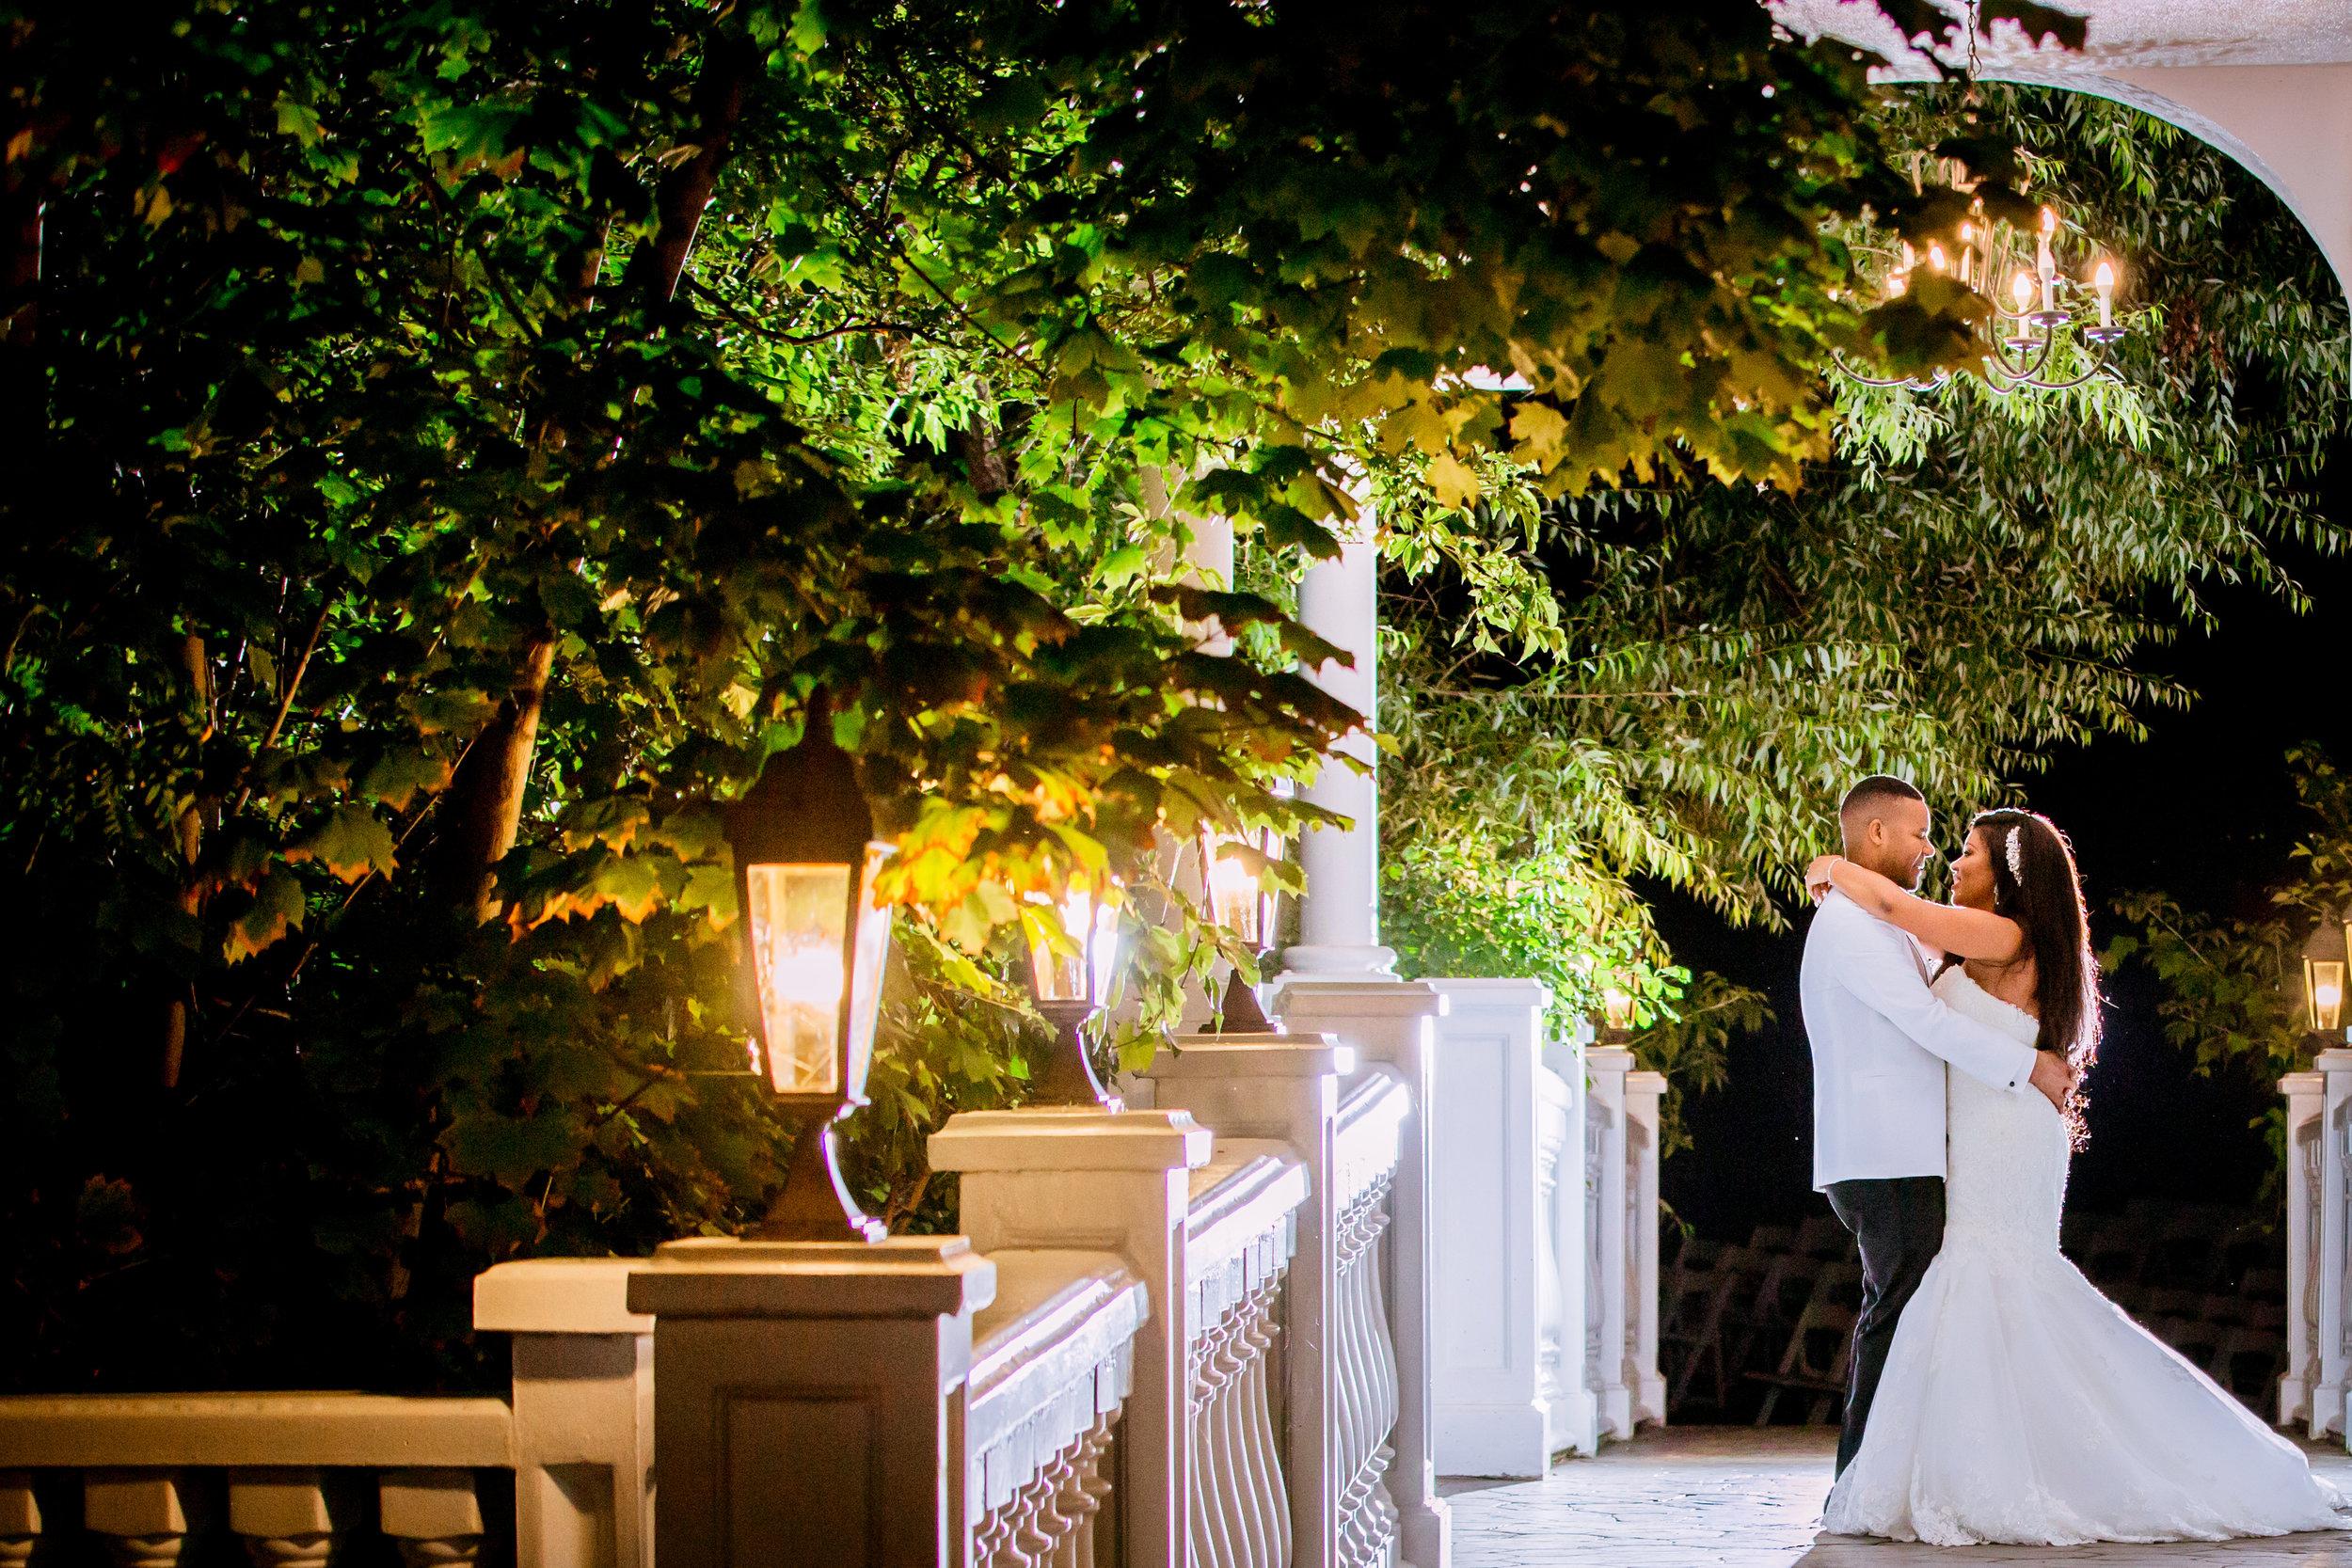 Lavinia_Carl_Wedding_Paradise_Banquet_Hall_Karimah_Gheddai_Photography_12